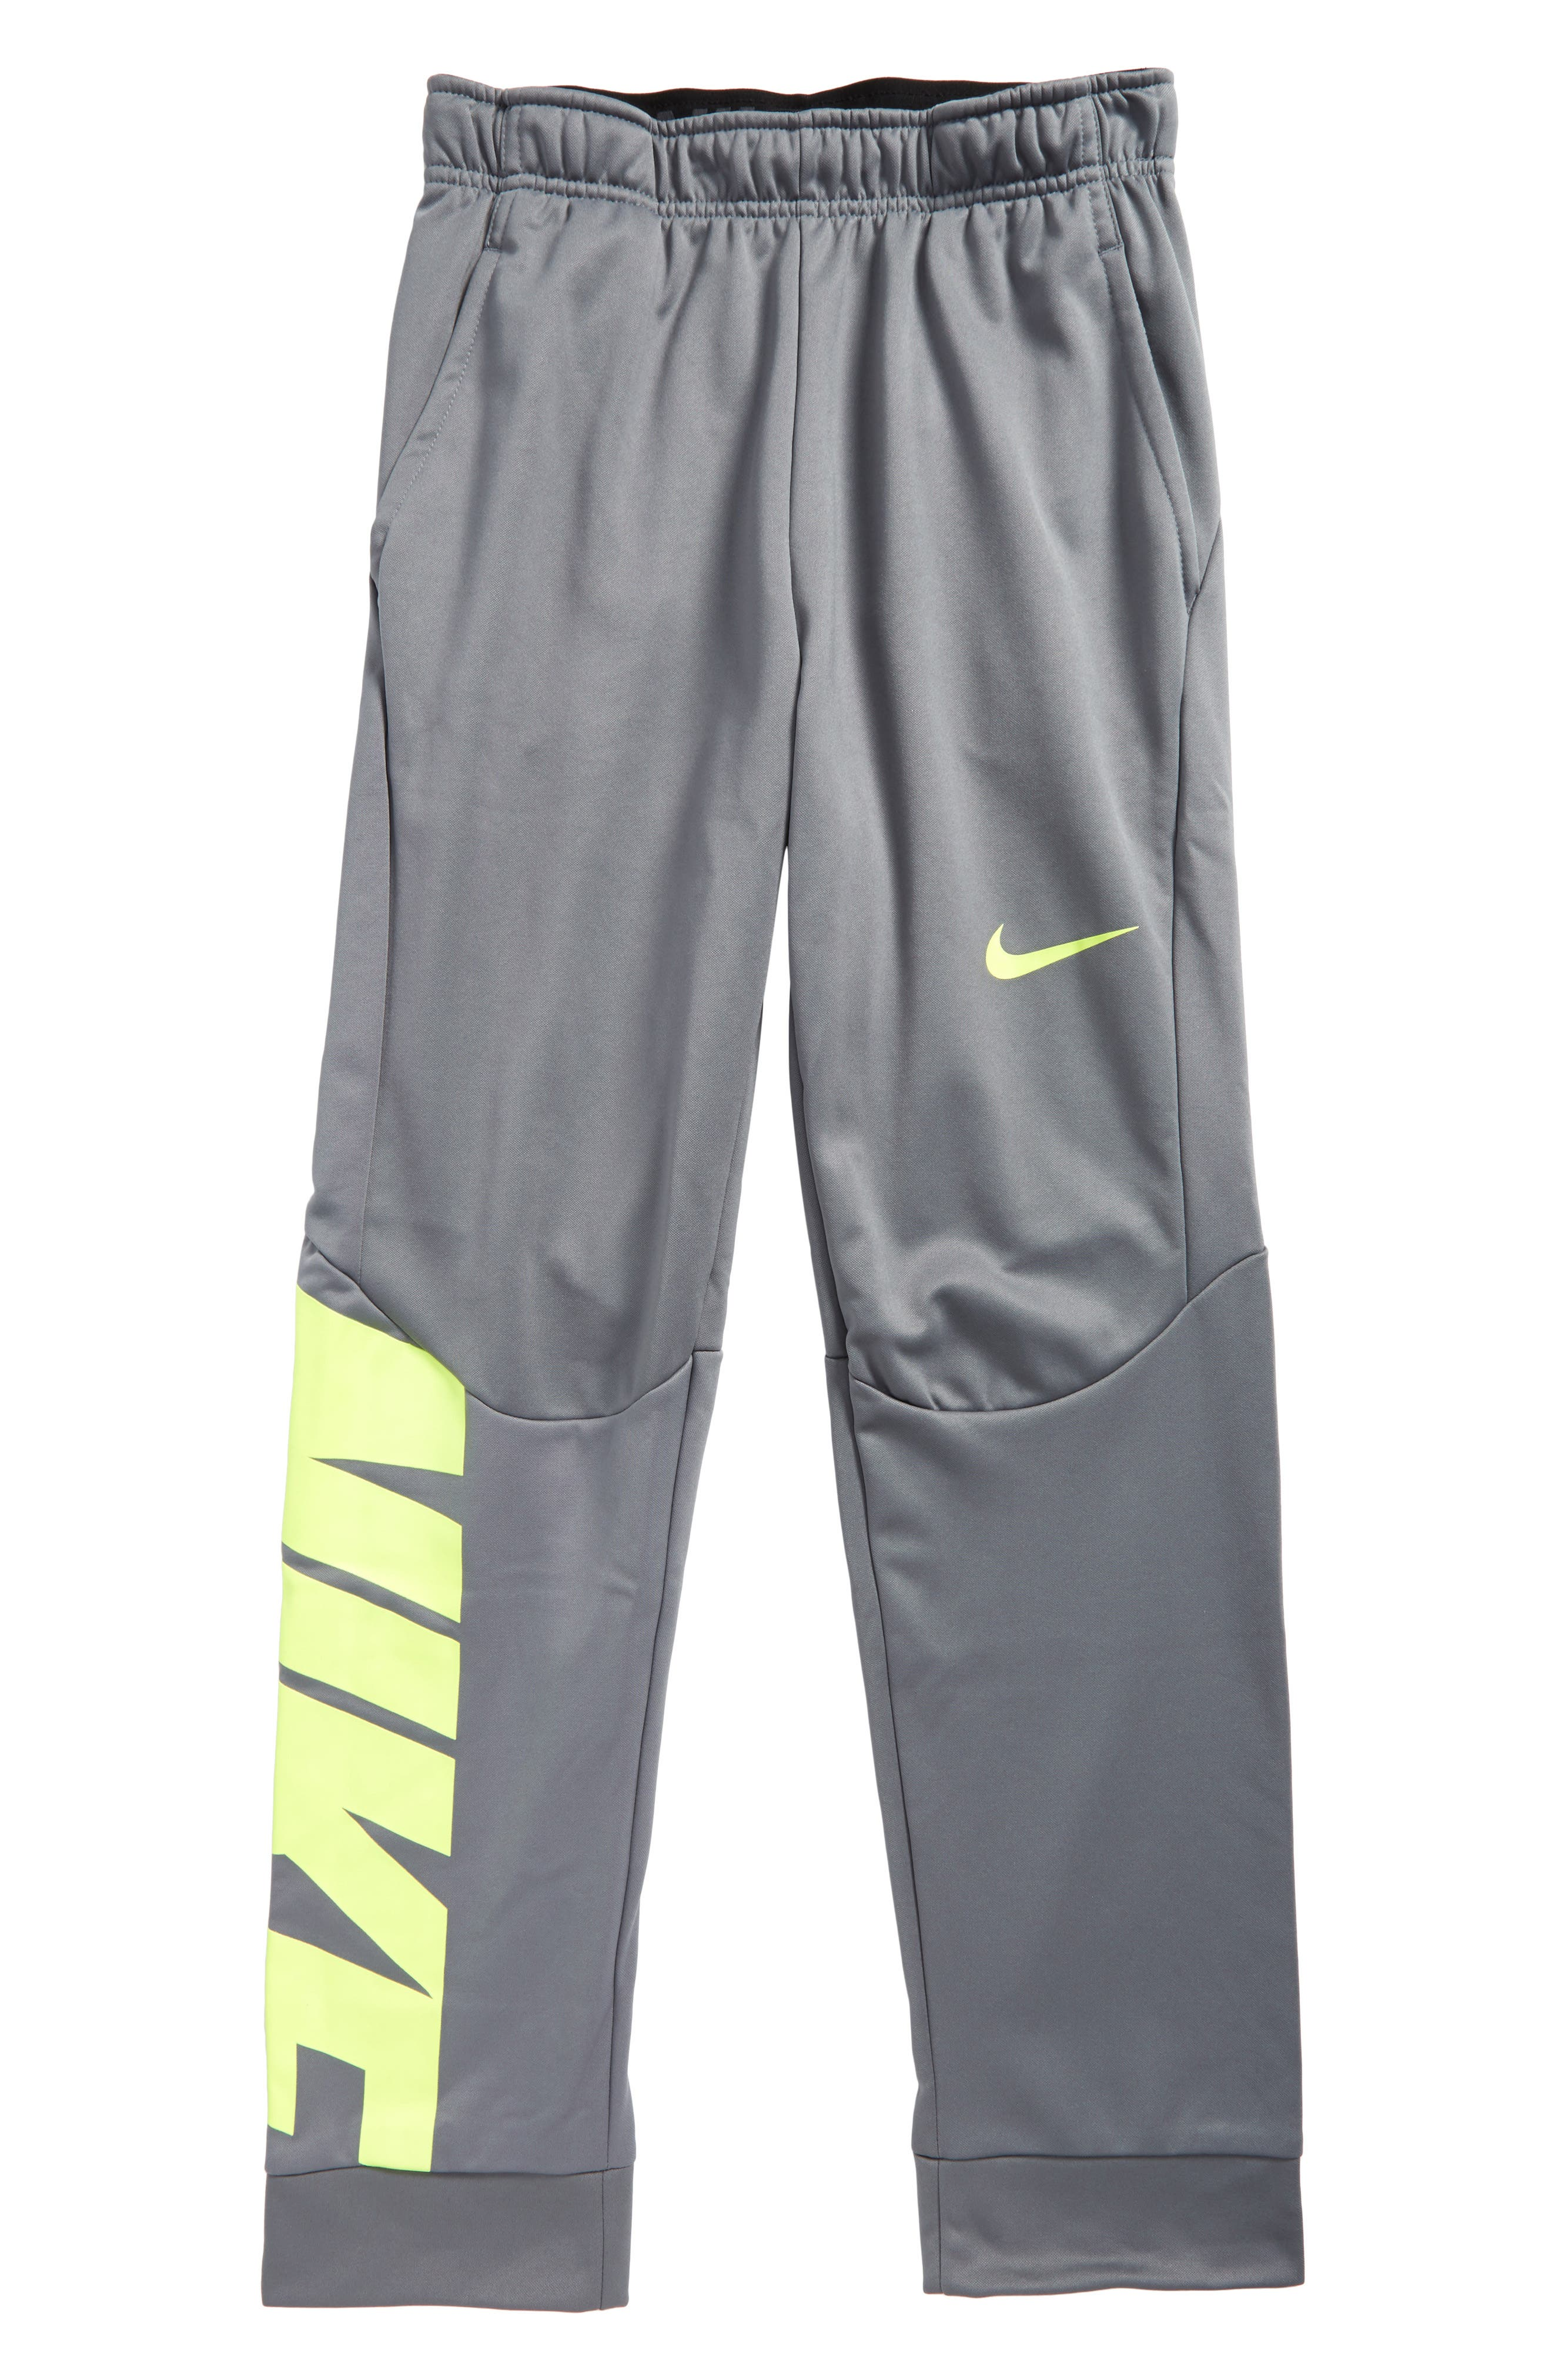 Main Image - Nike Therma-FIT GFX Fleece Jogger Pants (Little Boys & Big Boys)